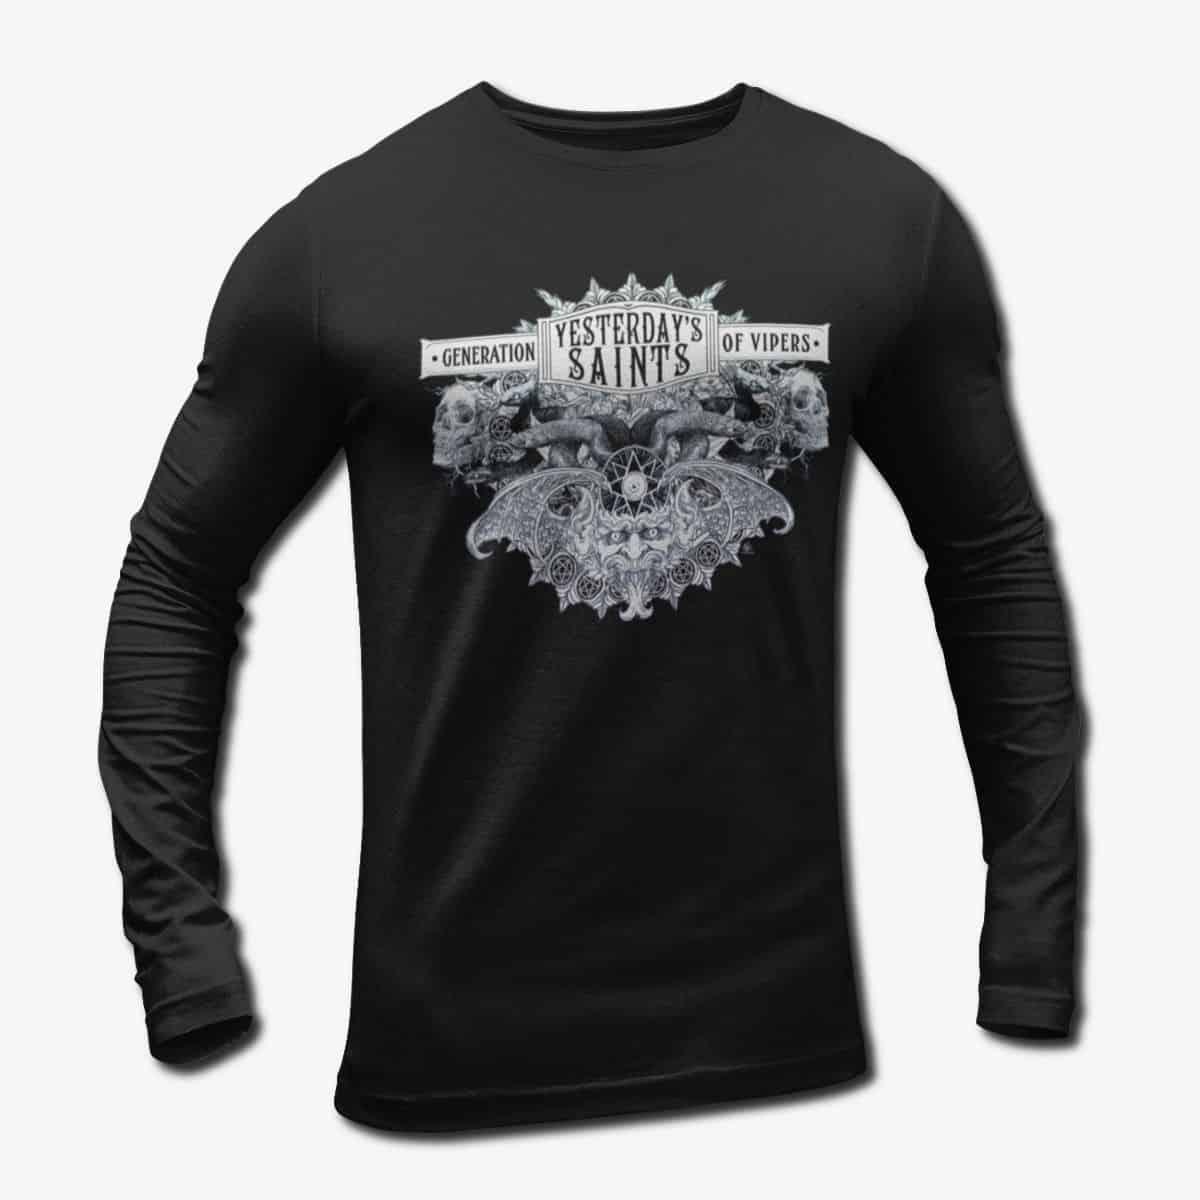 bb6fc59a1 Yesterday's Saints Long Sleeve T-Shirt, Yesterdays Saints Generation ...